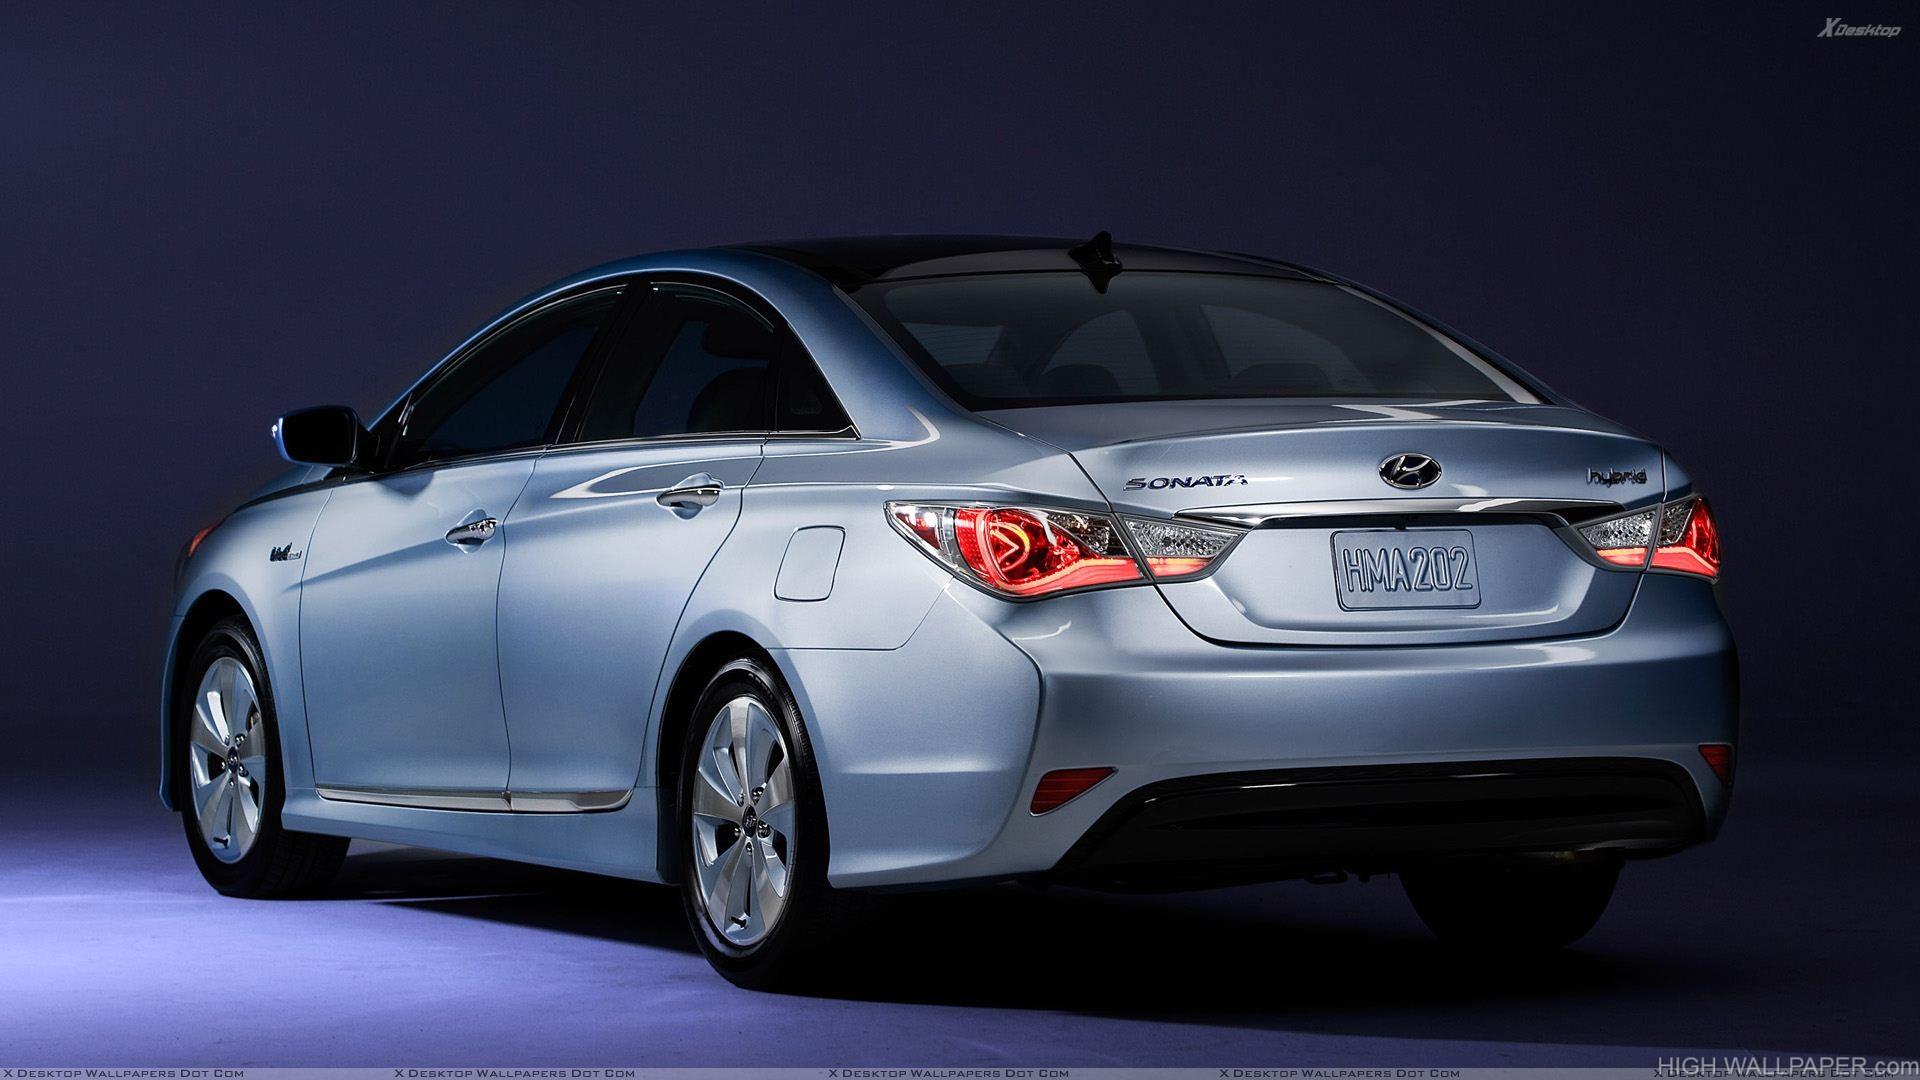 2011 Hyundai Sonata Hybrid Back Pose In Silver